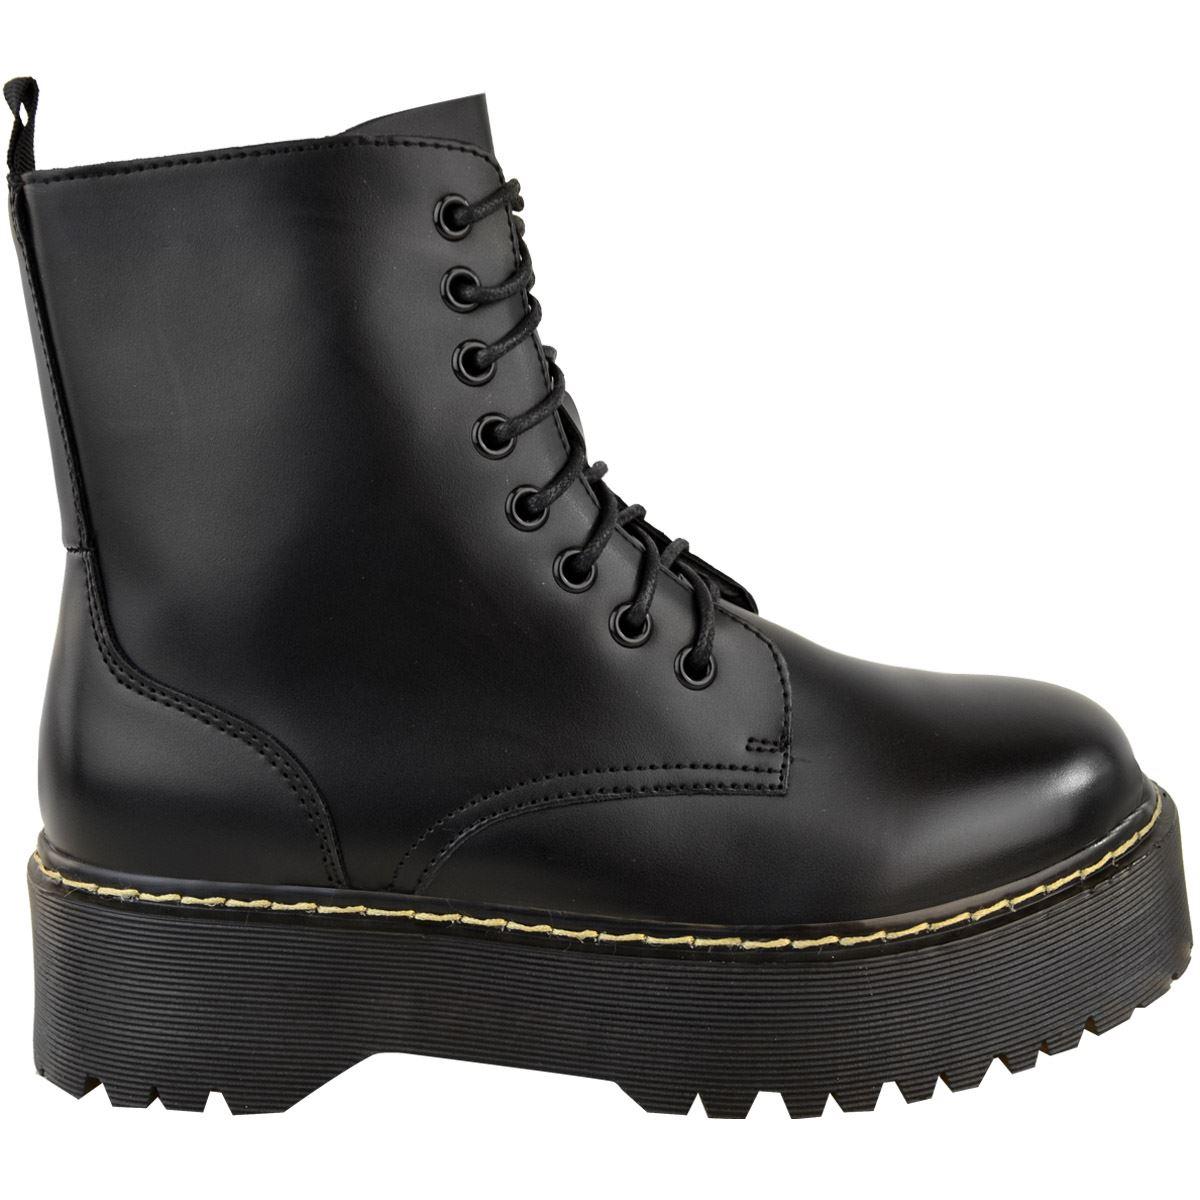 Womens-Ladies-Chunky-Lace-Up-Ankle-Boots-Platform-Icon-Retro-Goth-Punk-Black miniatuur 4